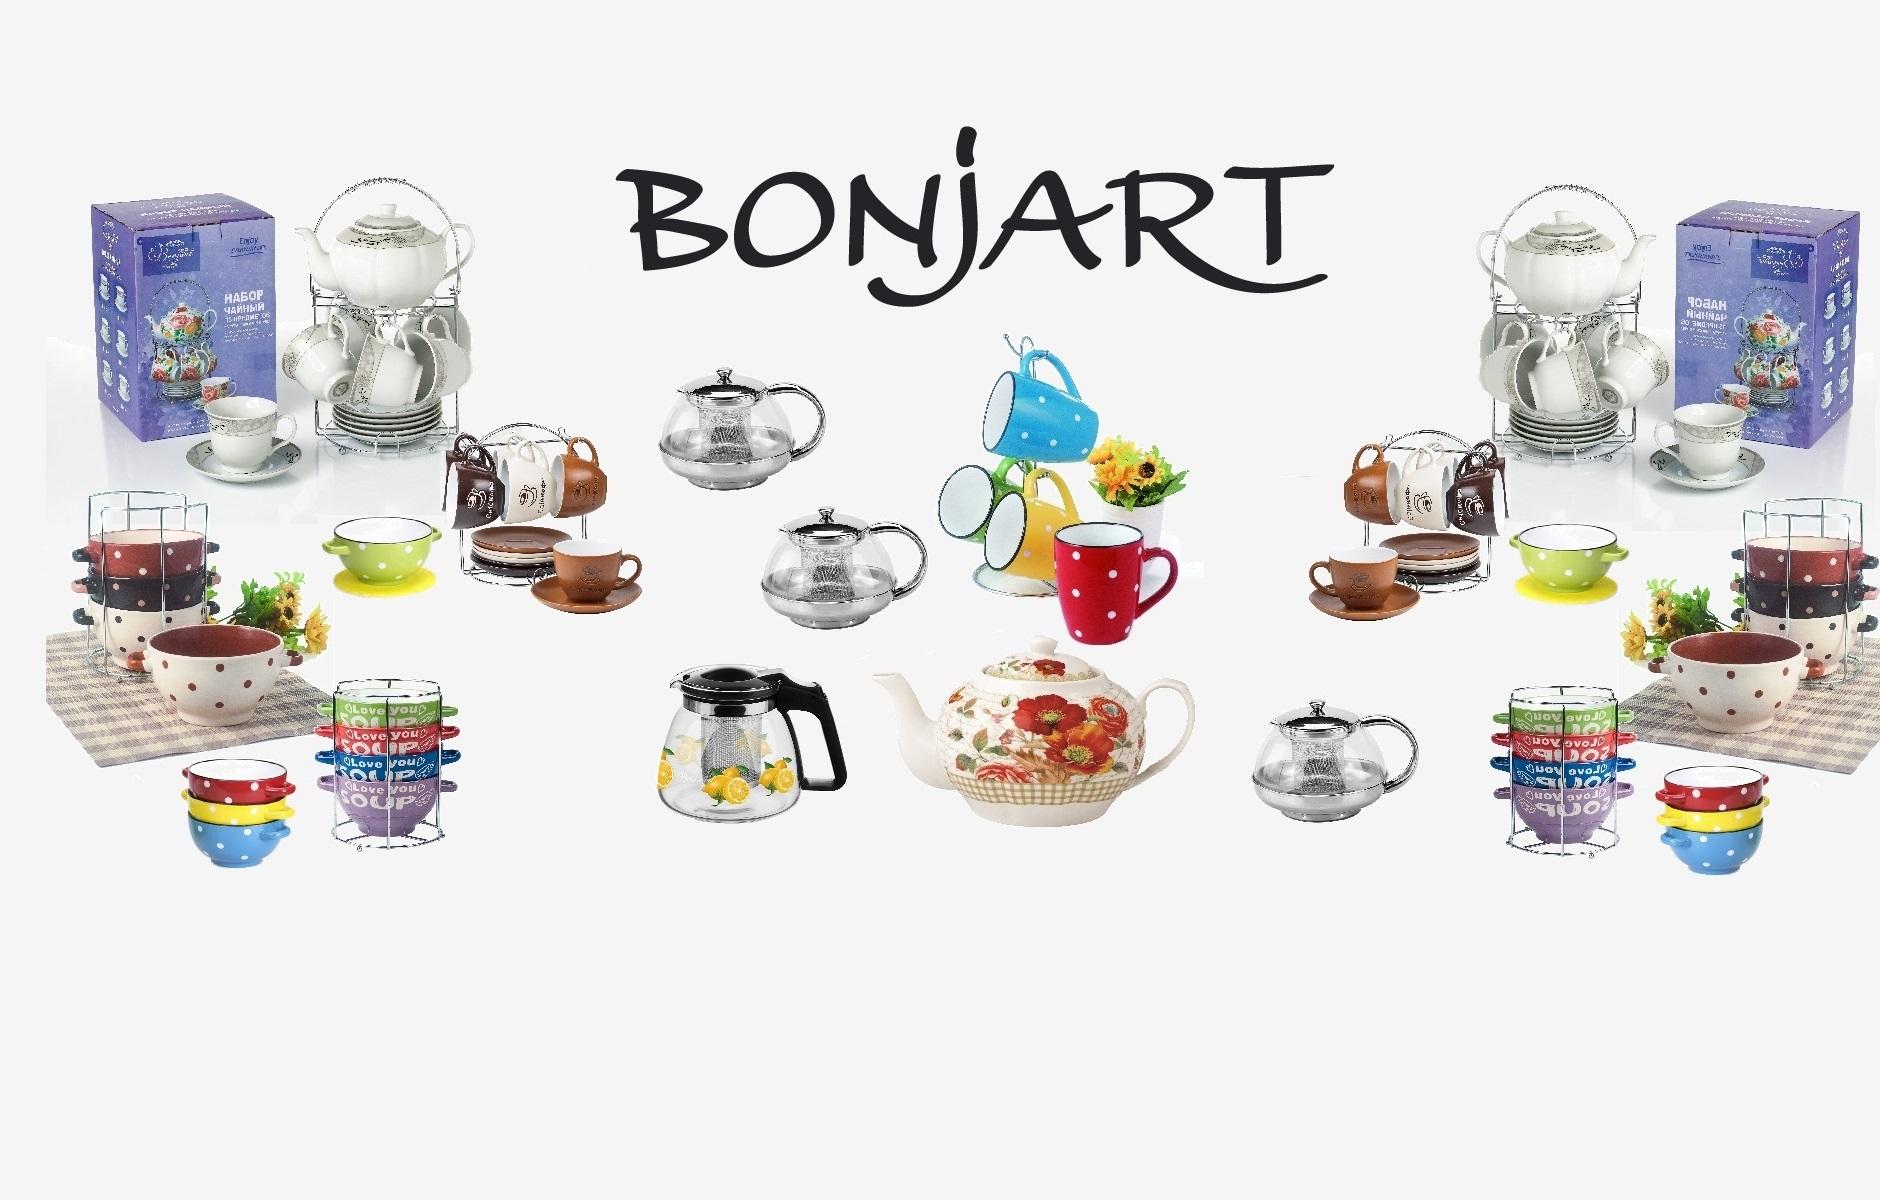 BONJART